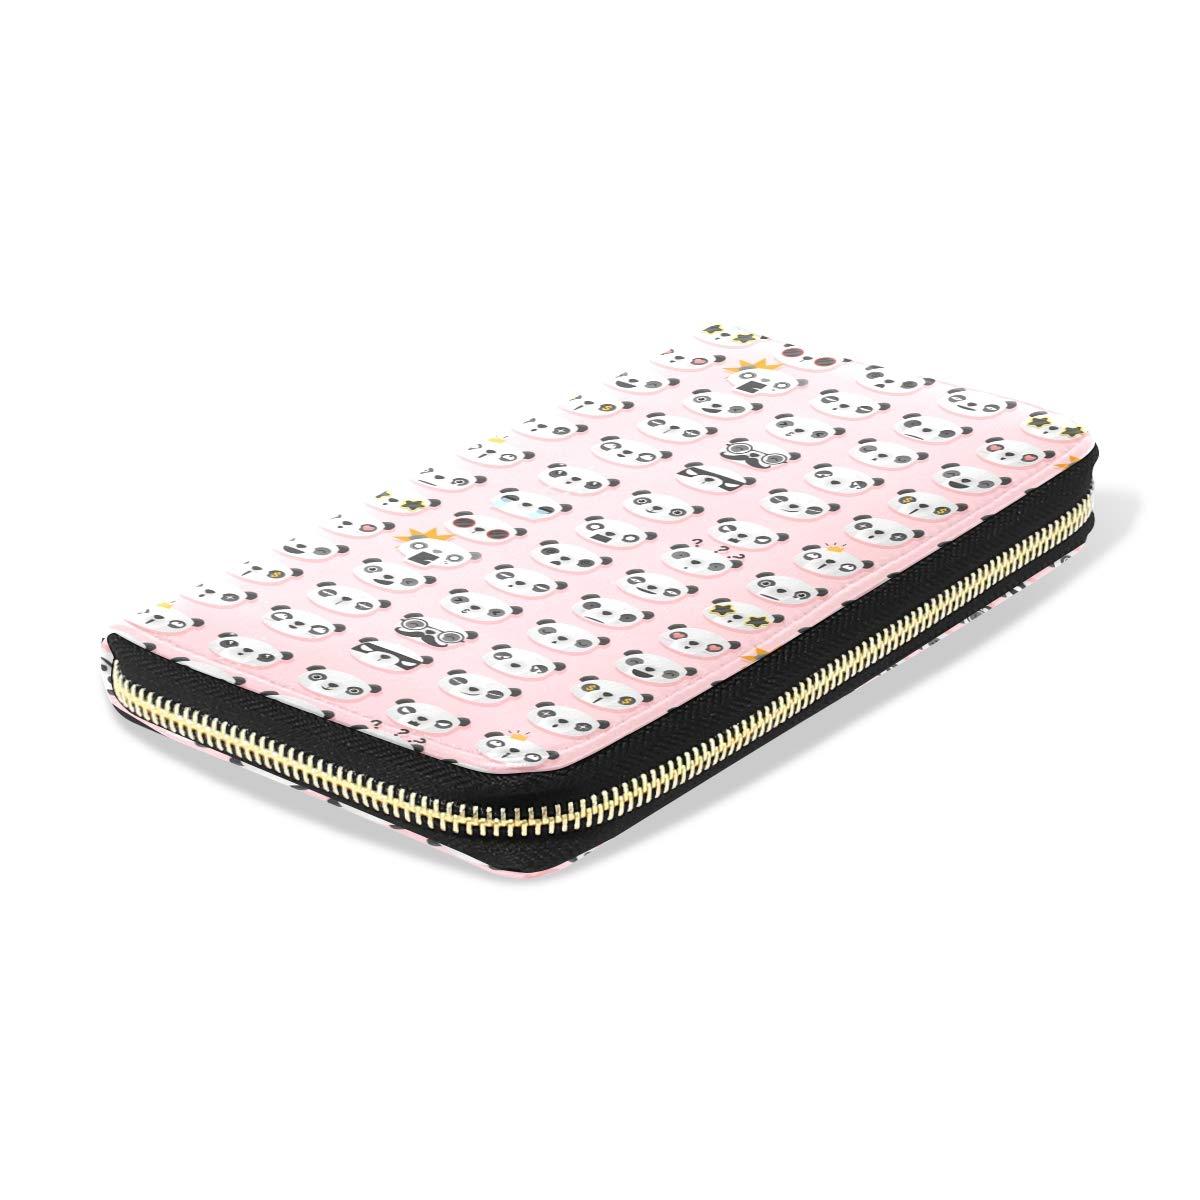 Women LeatherCute Pandas Heart Print PinkWallet Large Capacity Zipper Travel Wristlet Bags Clutch Cellphone Bag